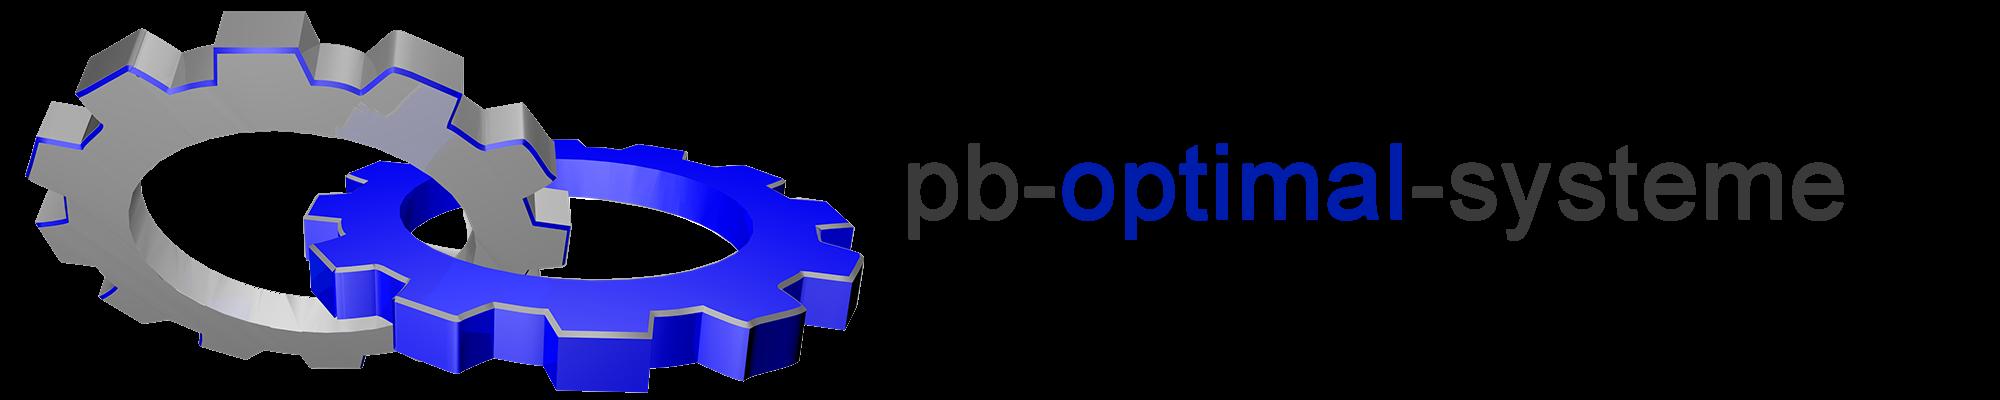 pb-optimal-systeme